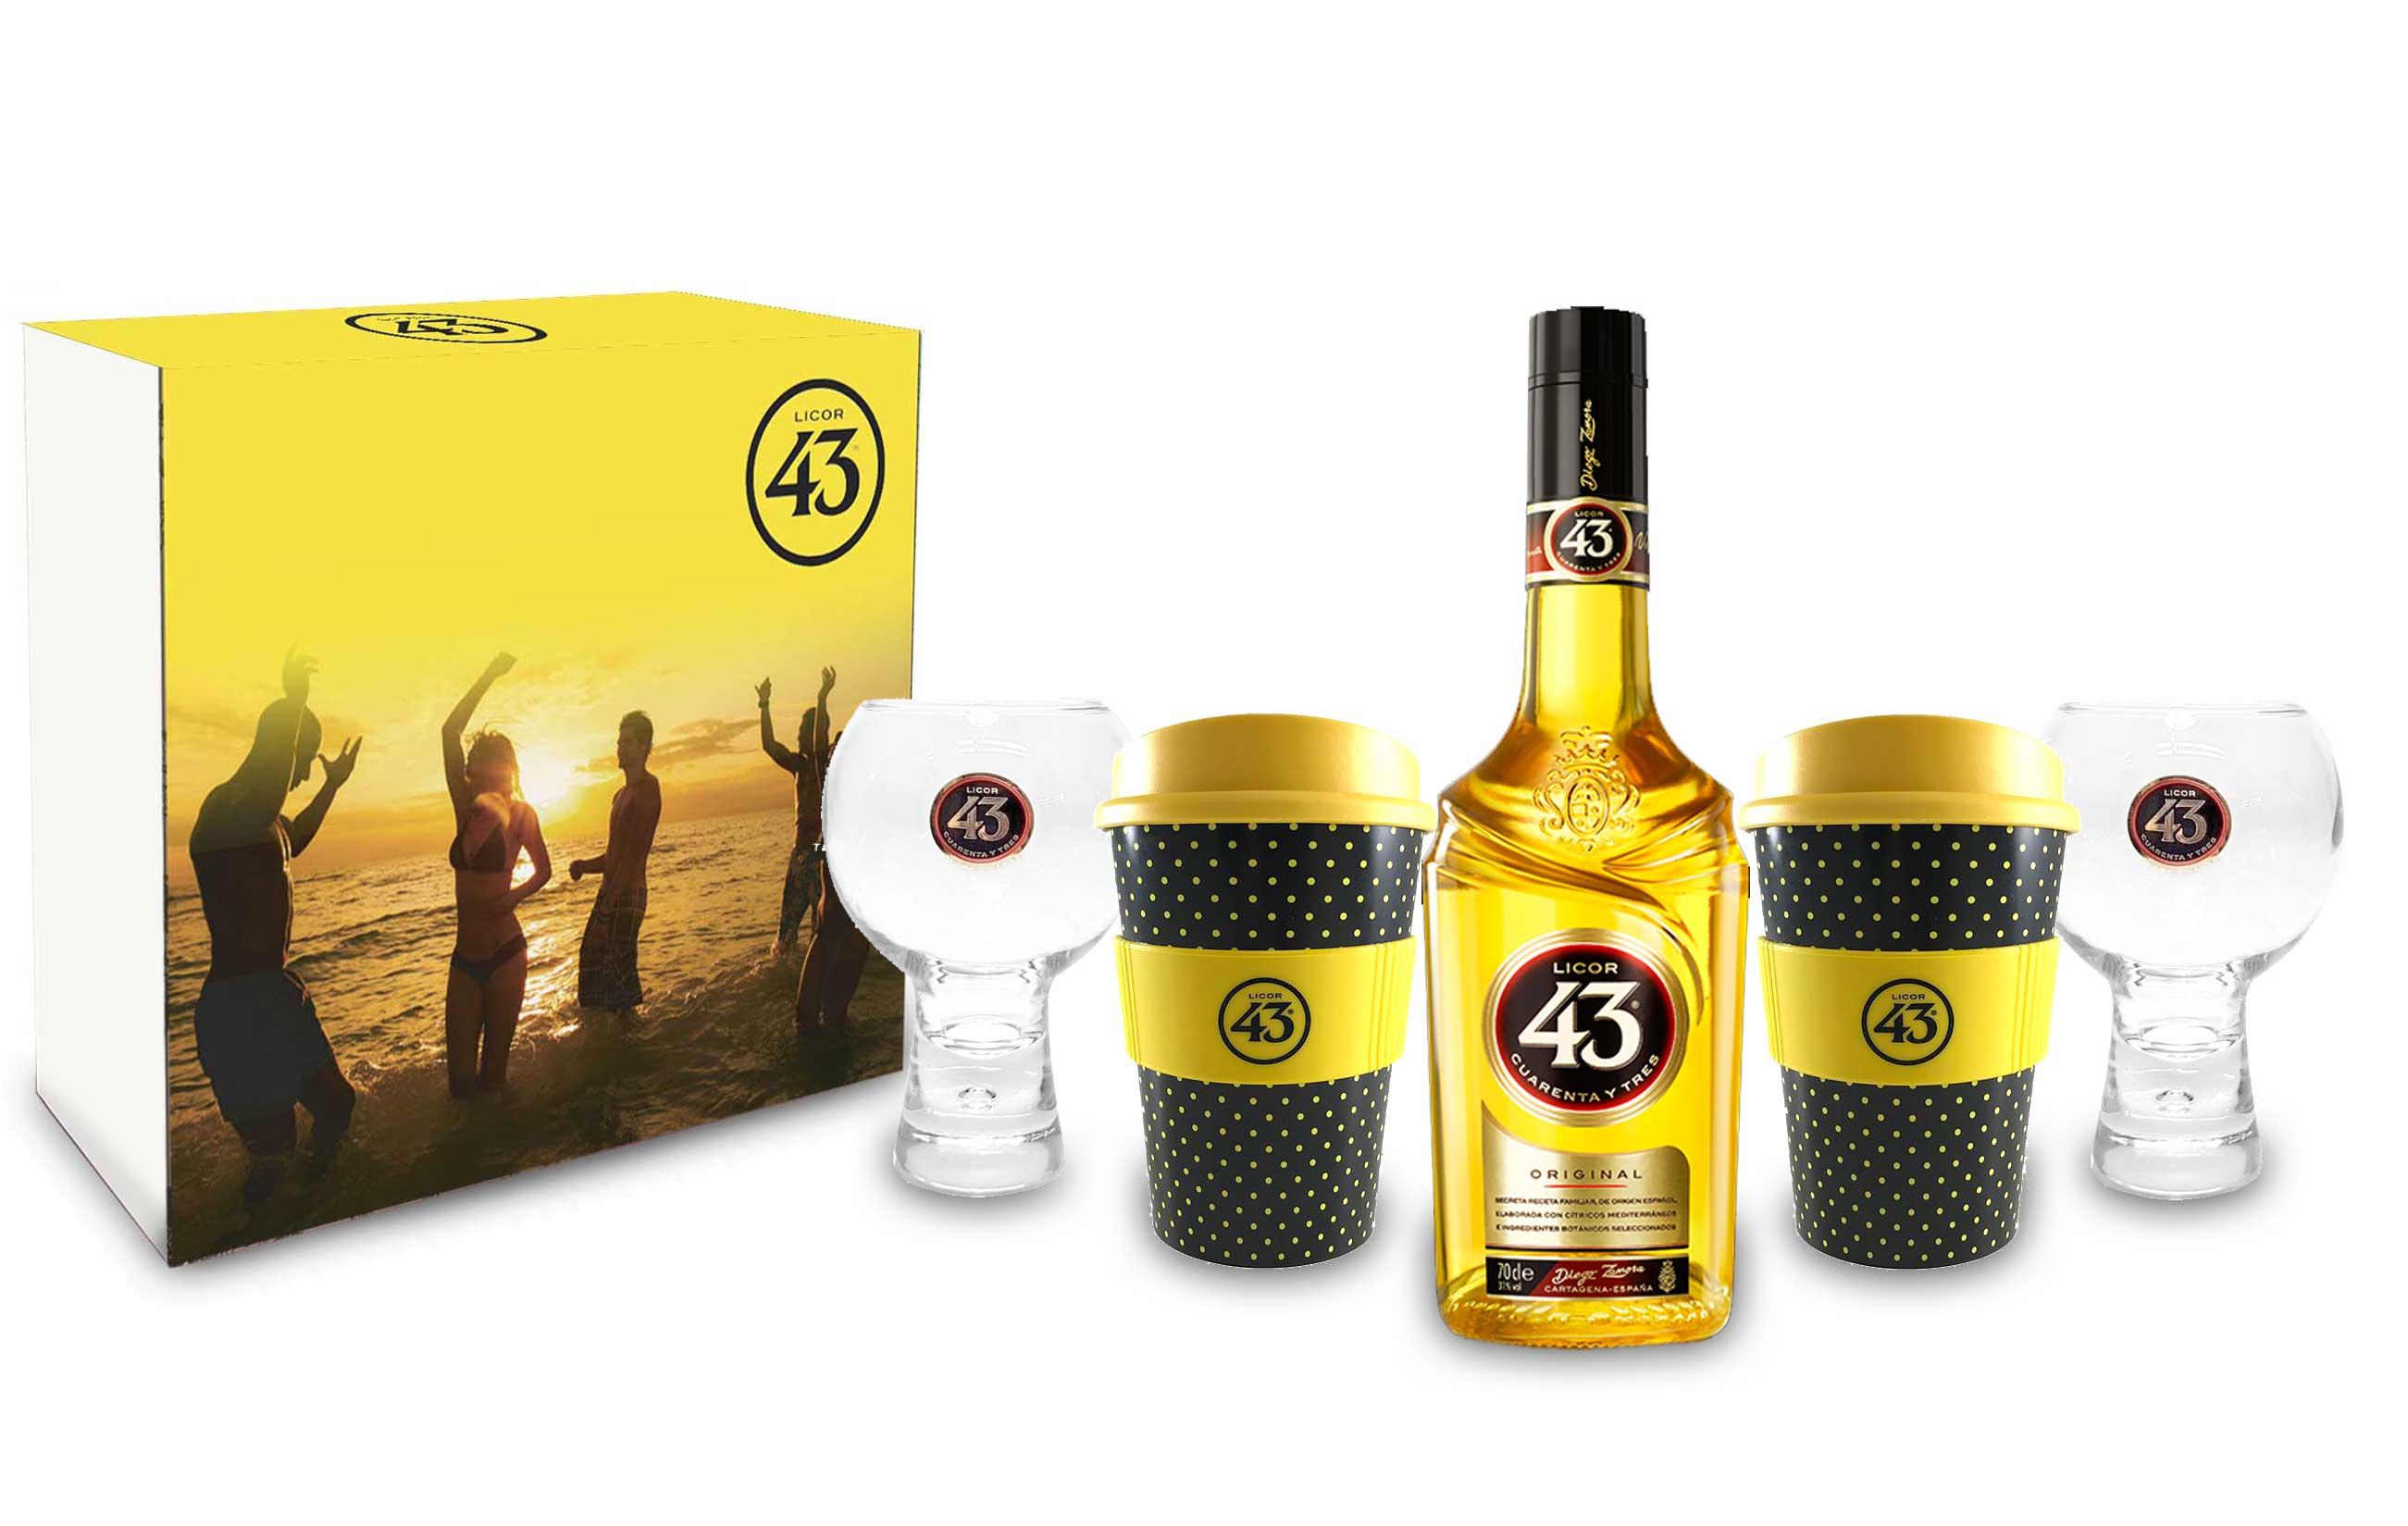 Licor 43 Geschenkset Cuarenta y Tres 0,7l (31% Vol) + 2x Ballon Tumbler Gläser +2 Likör Liquor 43 Kaffee Becher -[Enthält Sulfite]